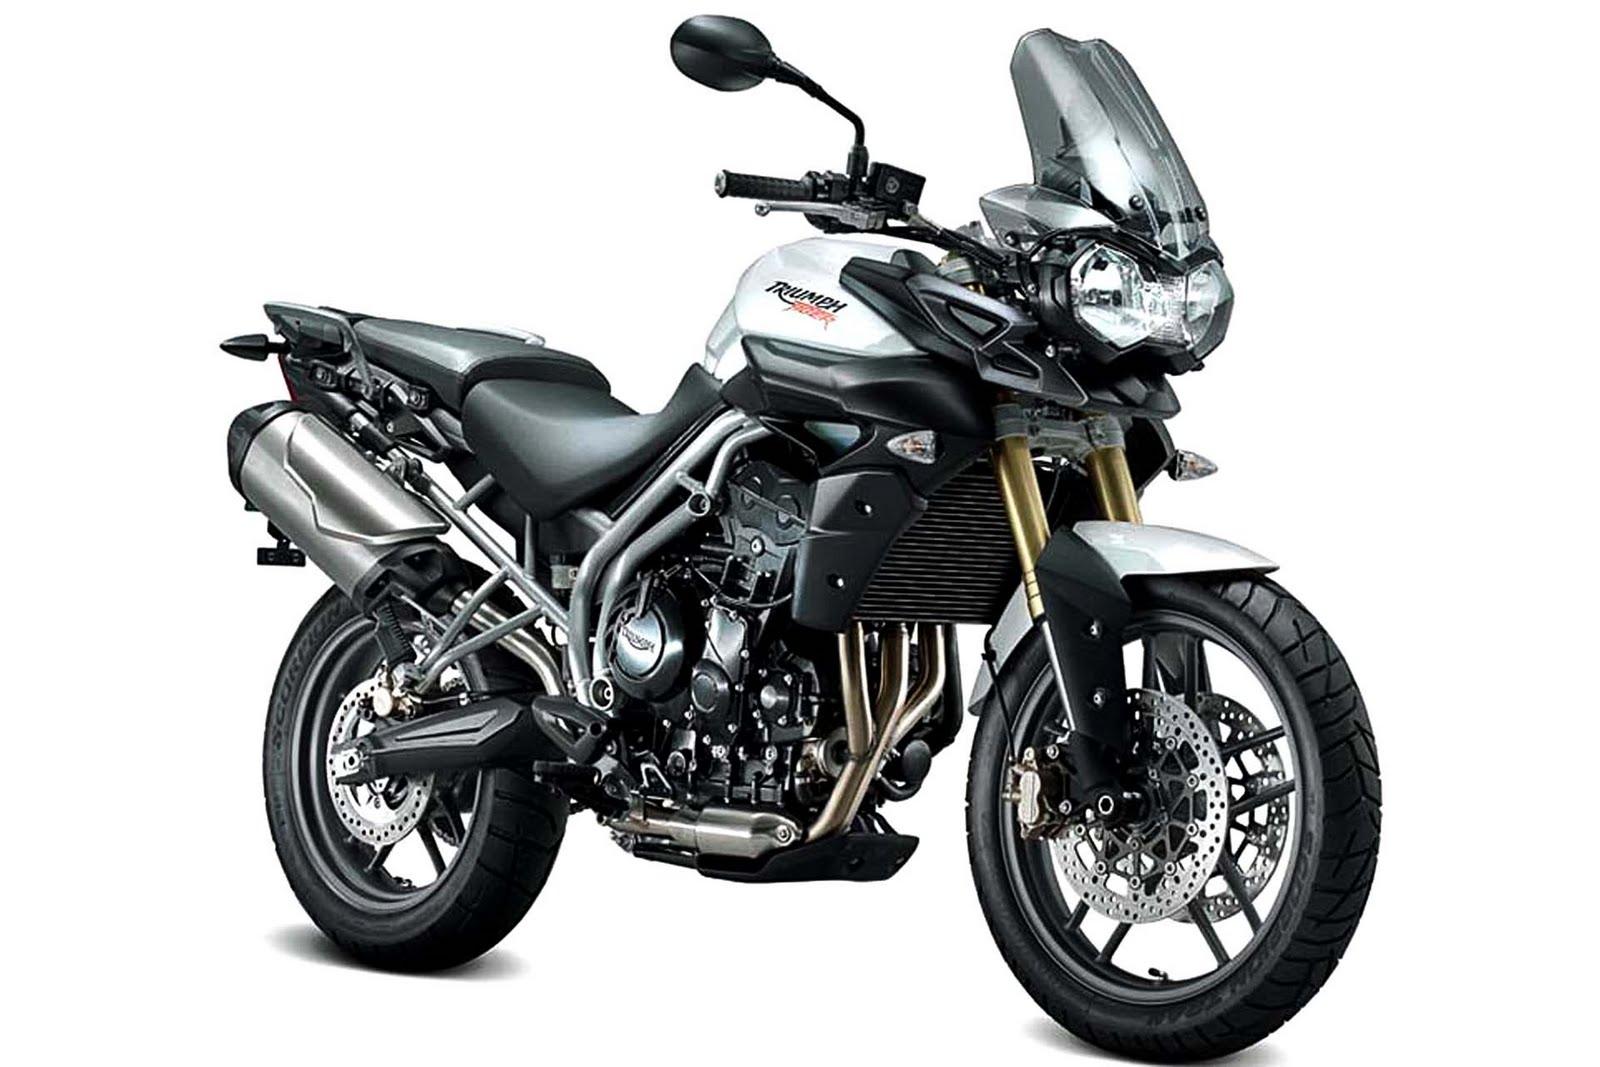 Triumph 800xc 2011